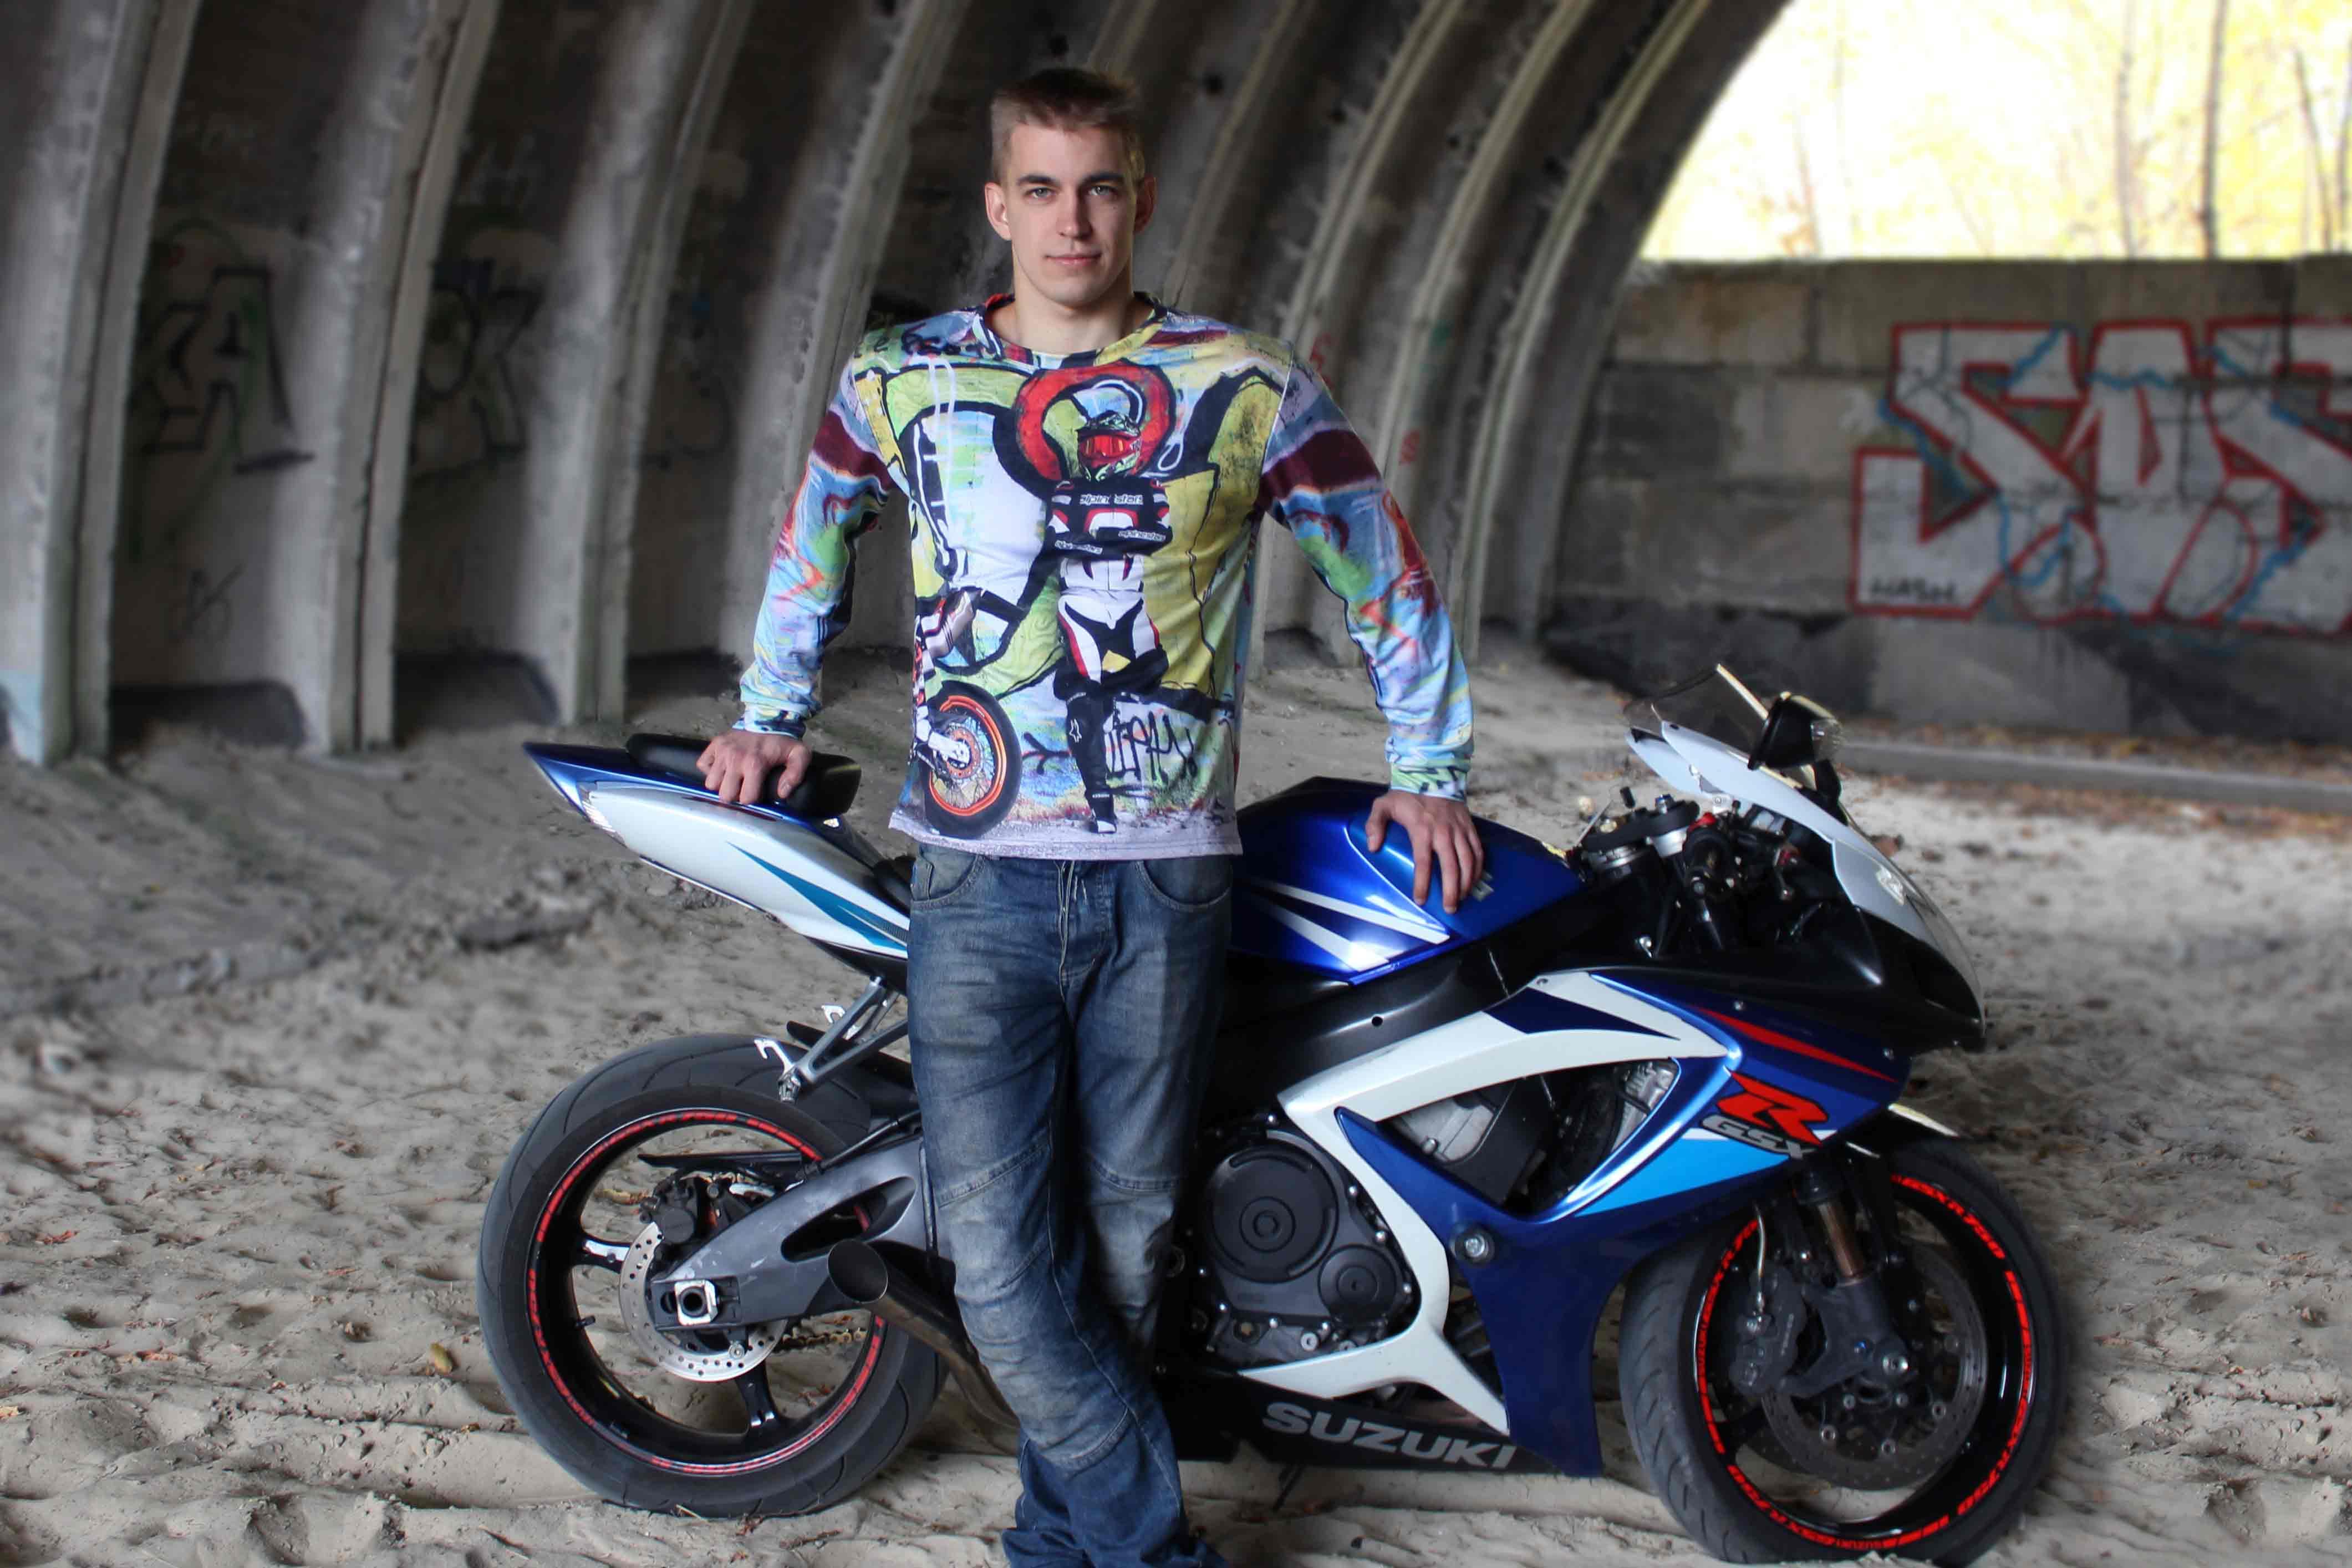 КОФТА 4Y PRINT ― Артмото - купить квадроцикл в украине и харькове, мотоцикл, снегоход, скутер, мопед, электромобиль